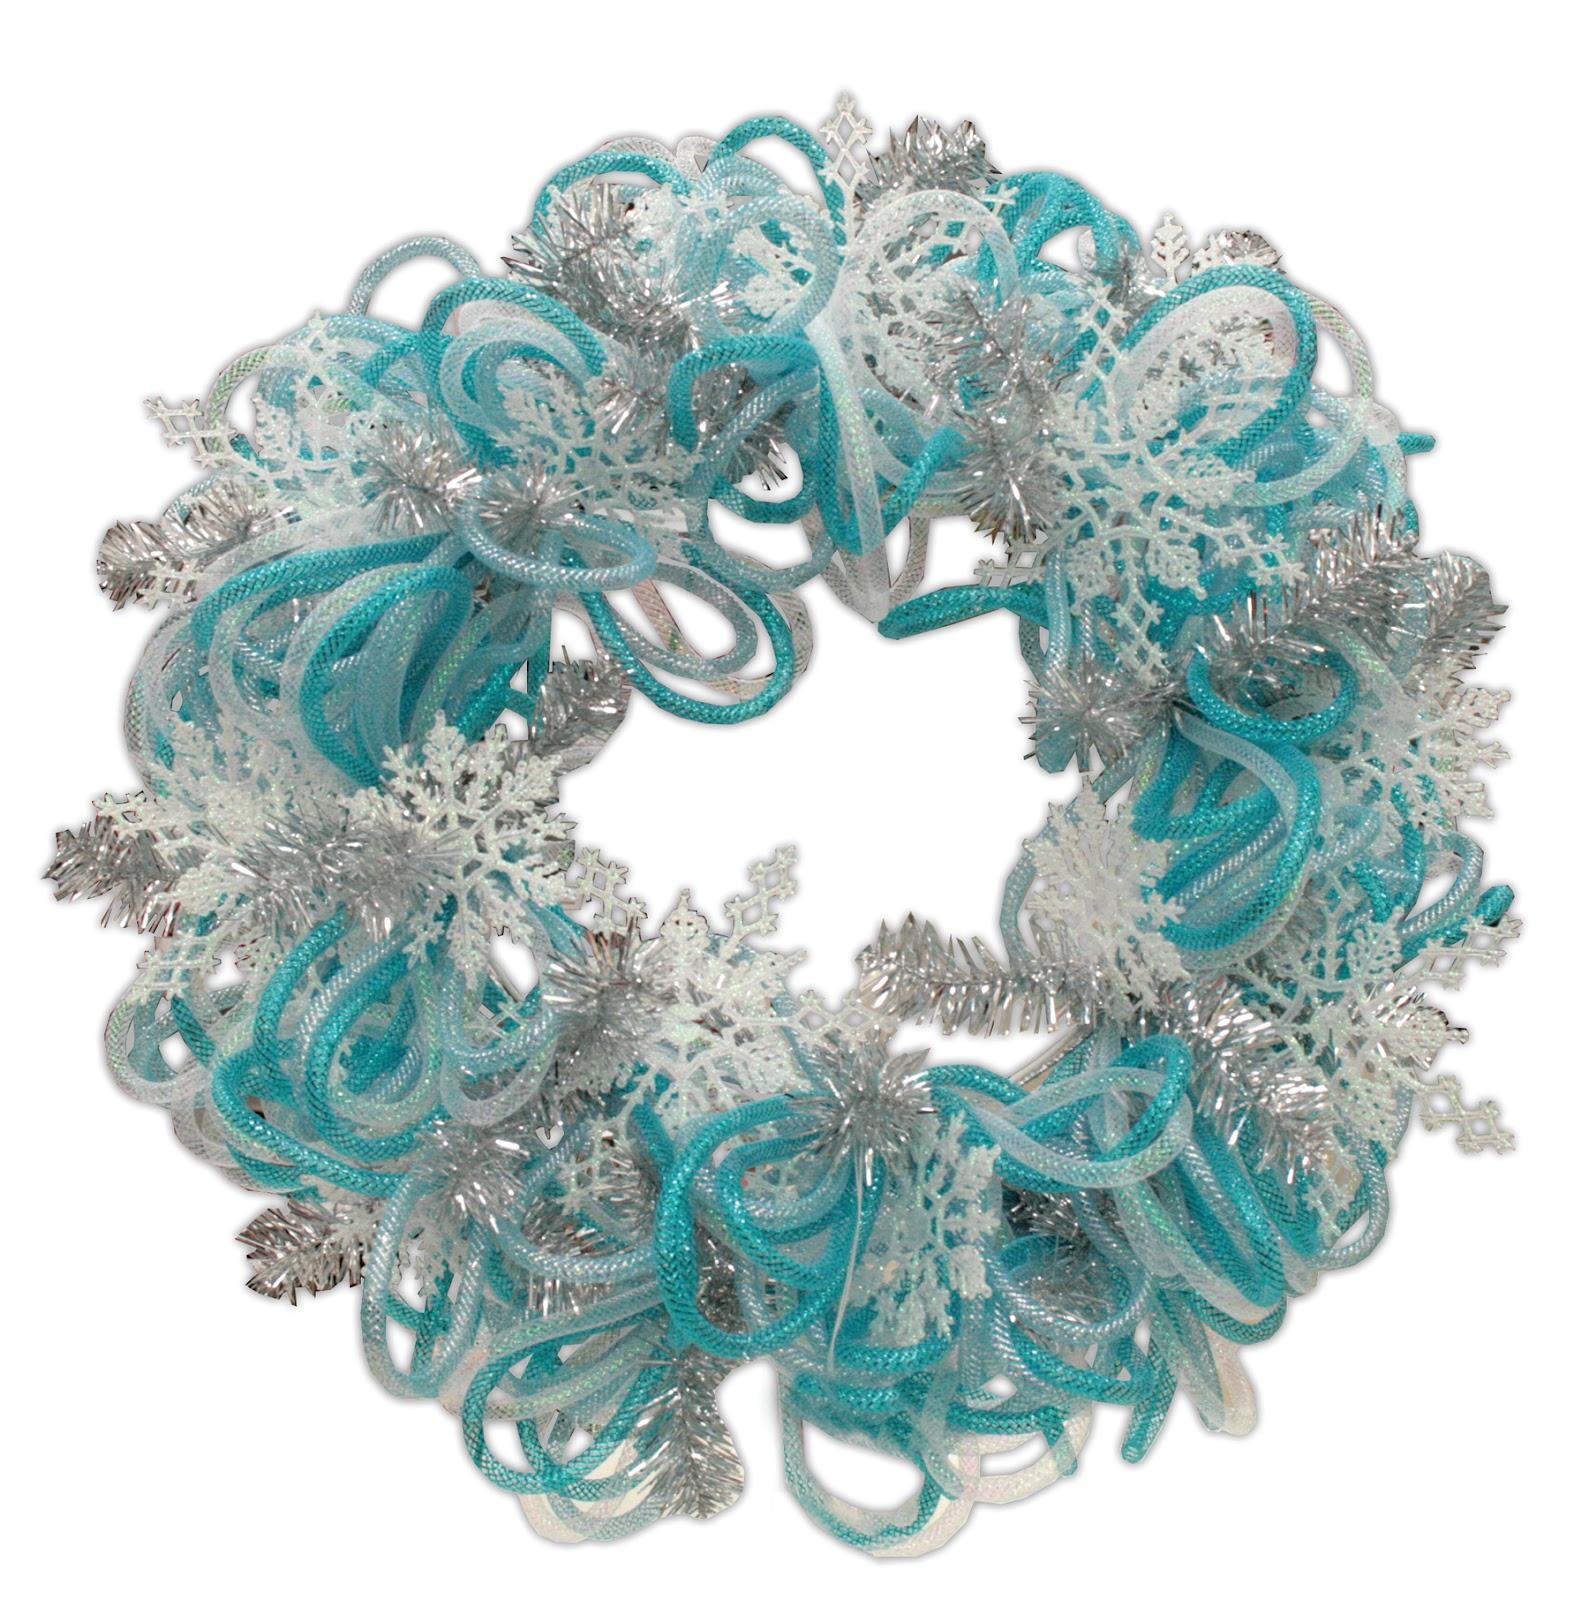 Crafts Direct Blog: Geomesh Wreaths